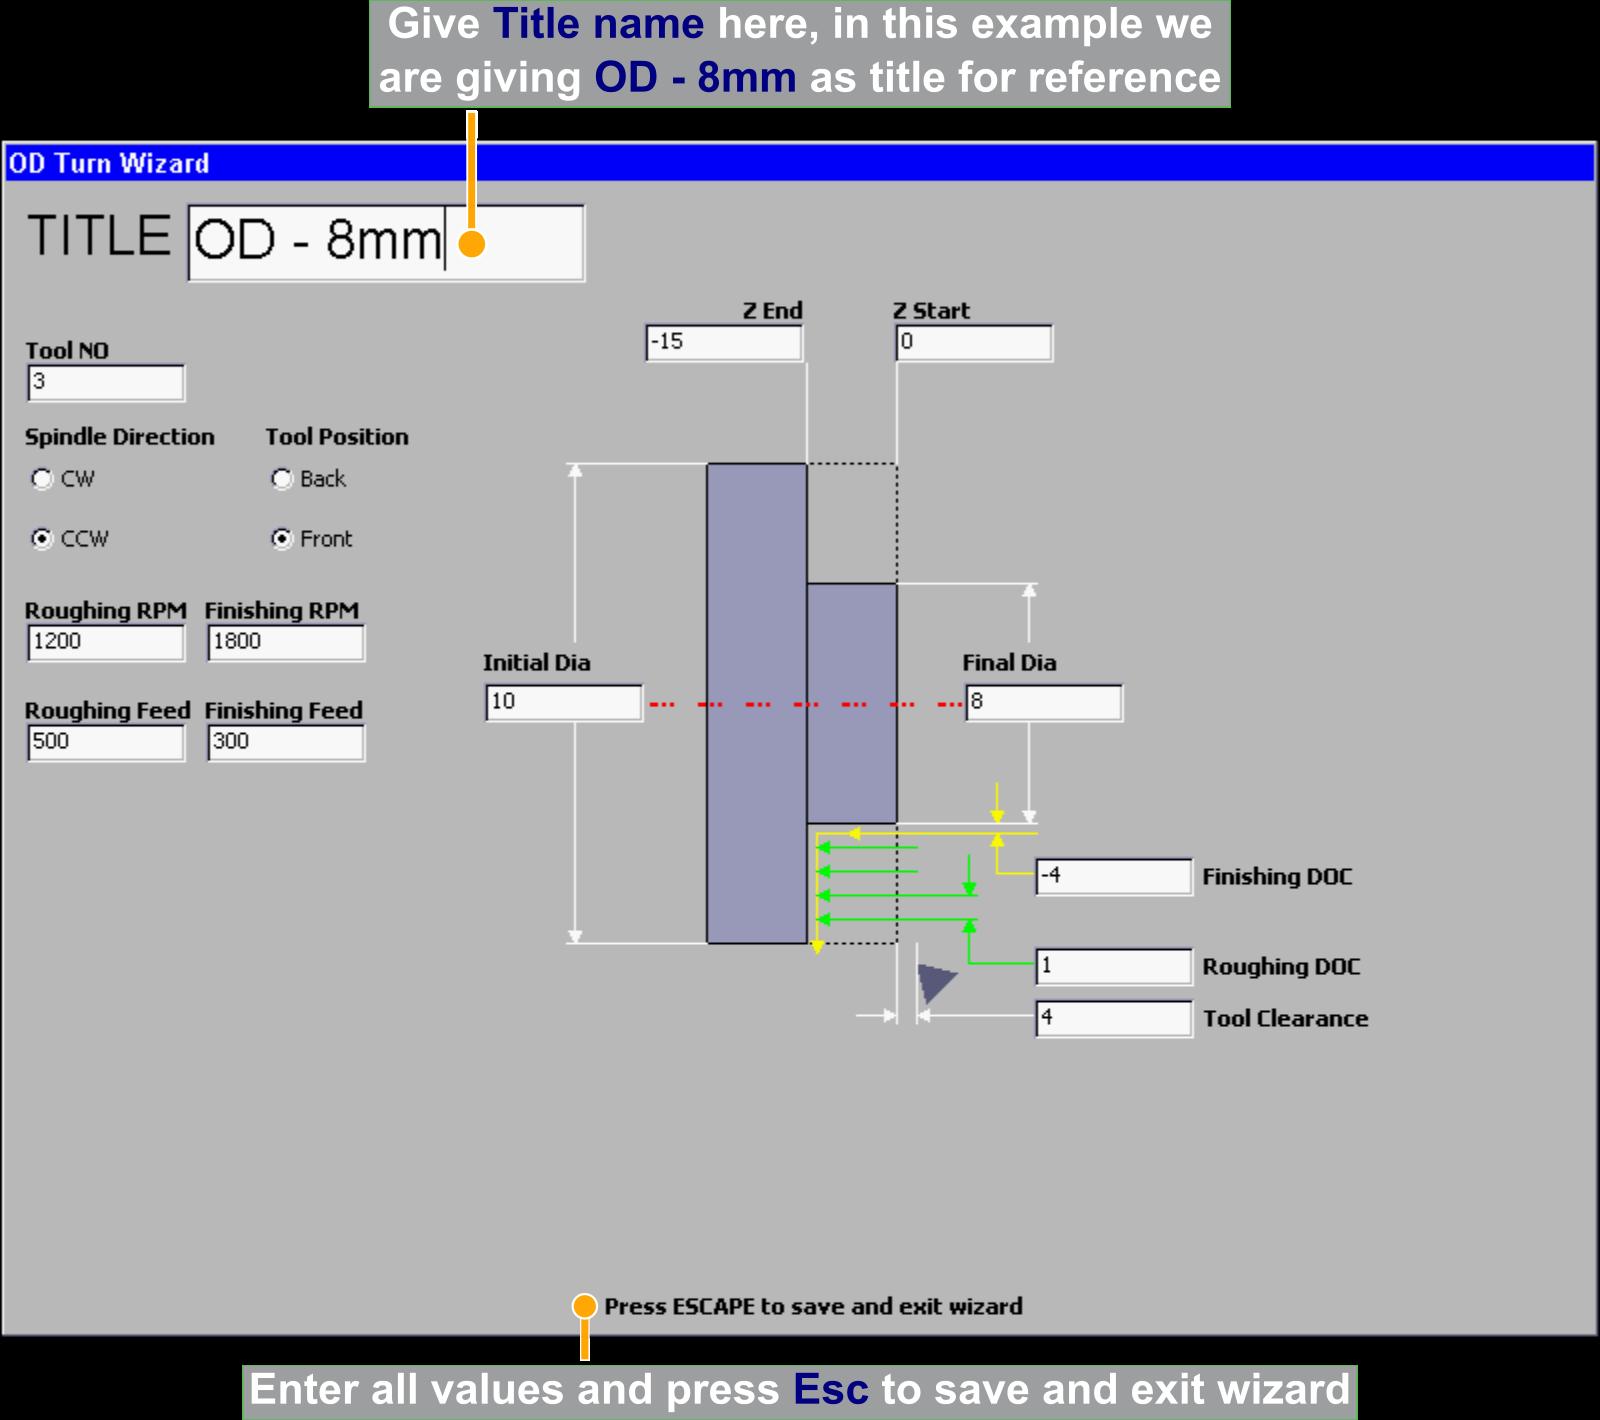 Hind cnc controller | Blog